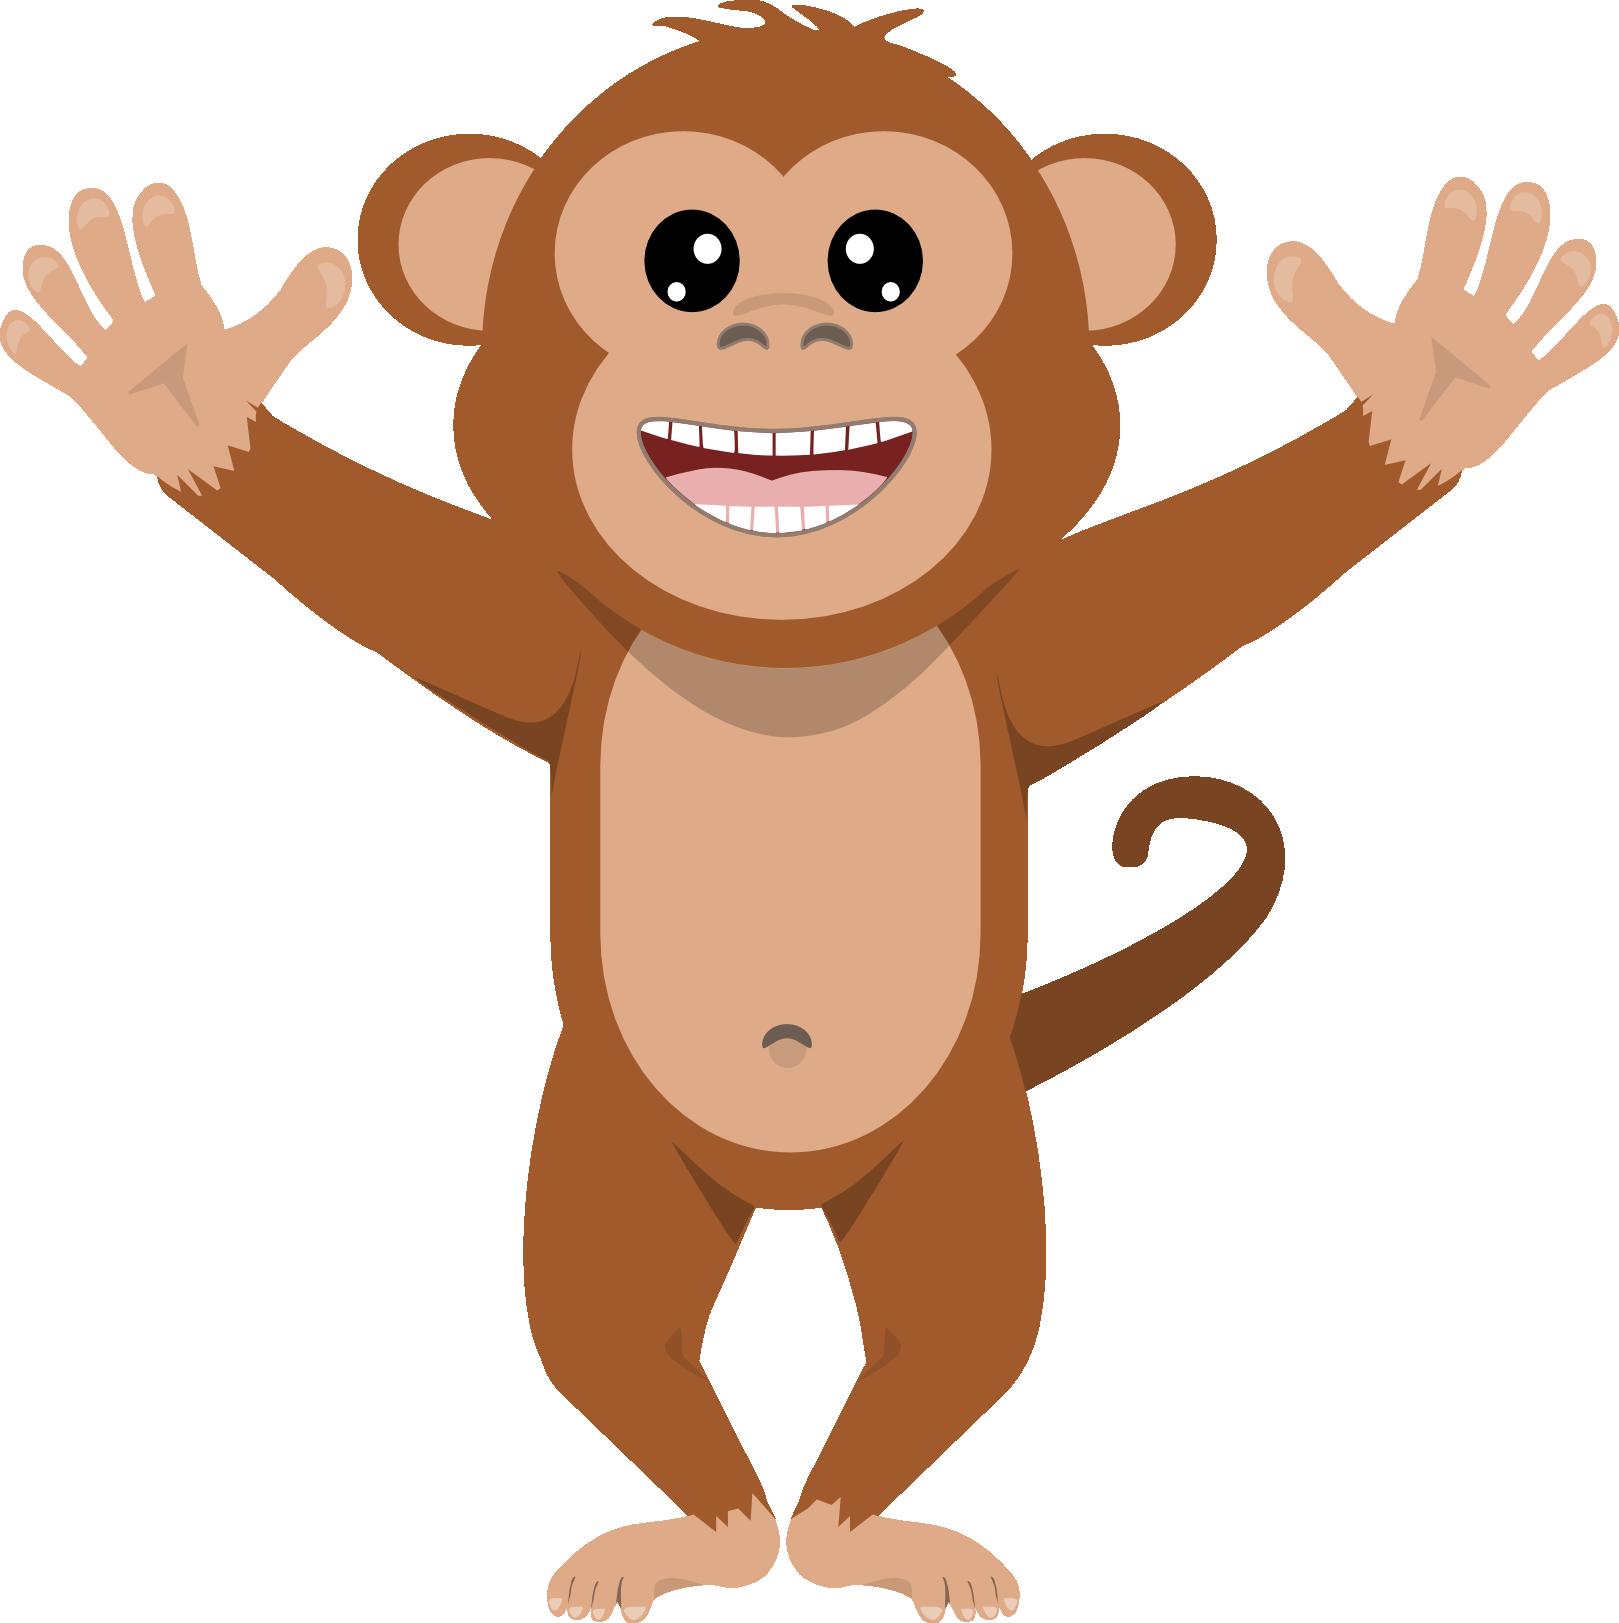 Ape clipart transparent background, Ape transparent.